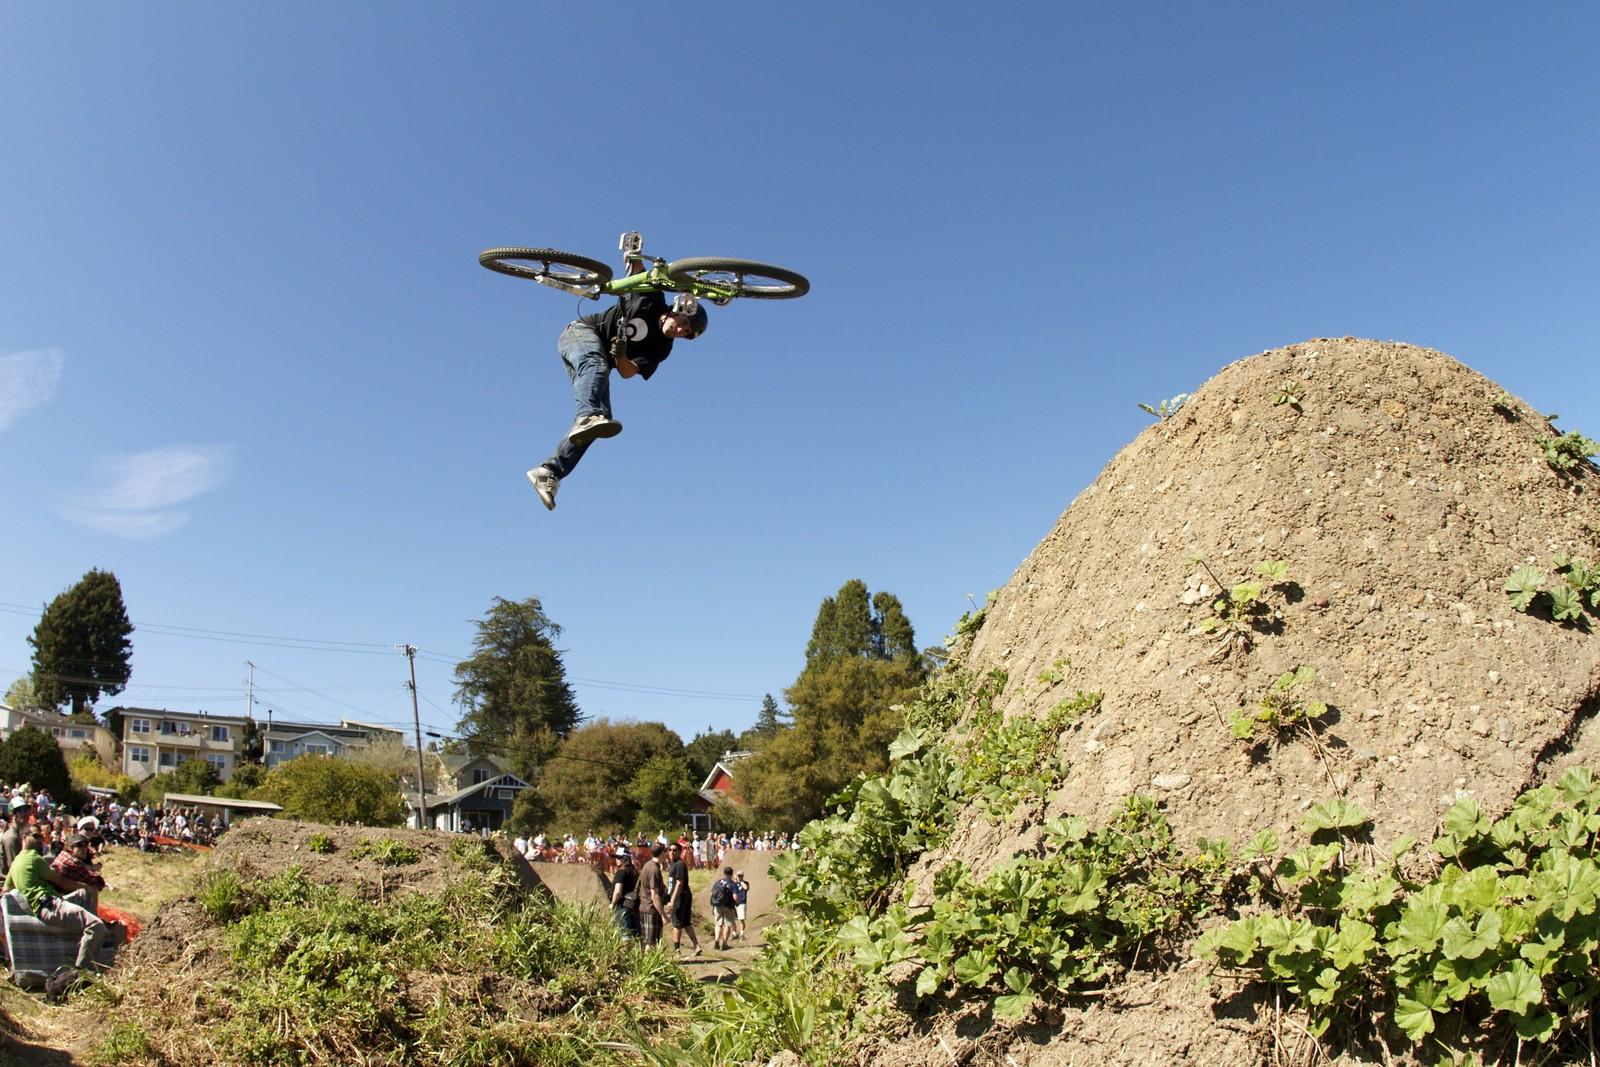 Ryan Howard Downside Whip Post Office - corytepper.com - Mountain Biking Pictures - Vital MTB